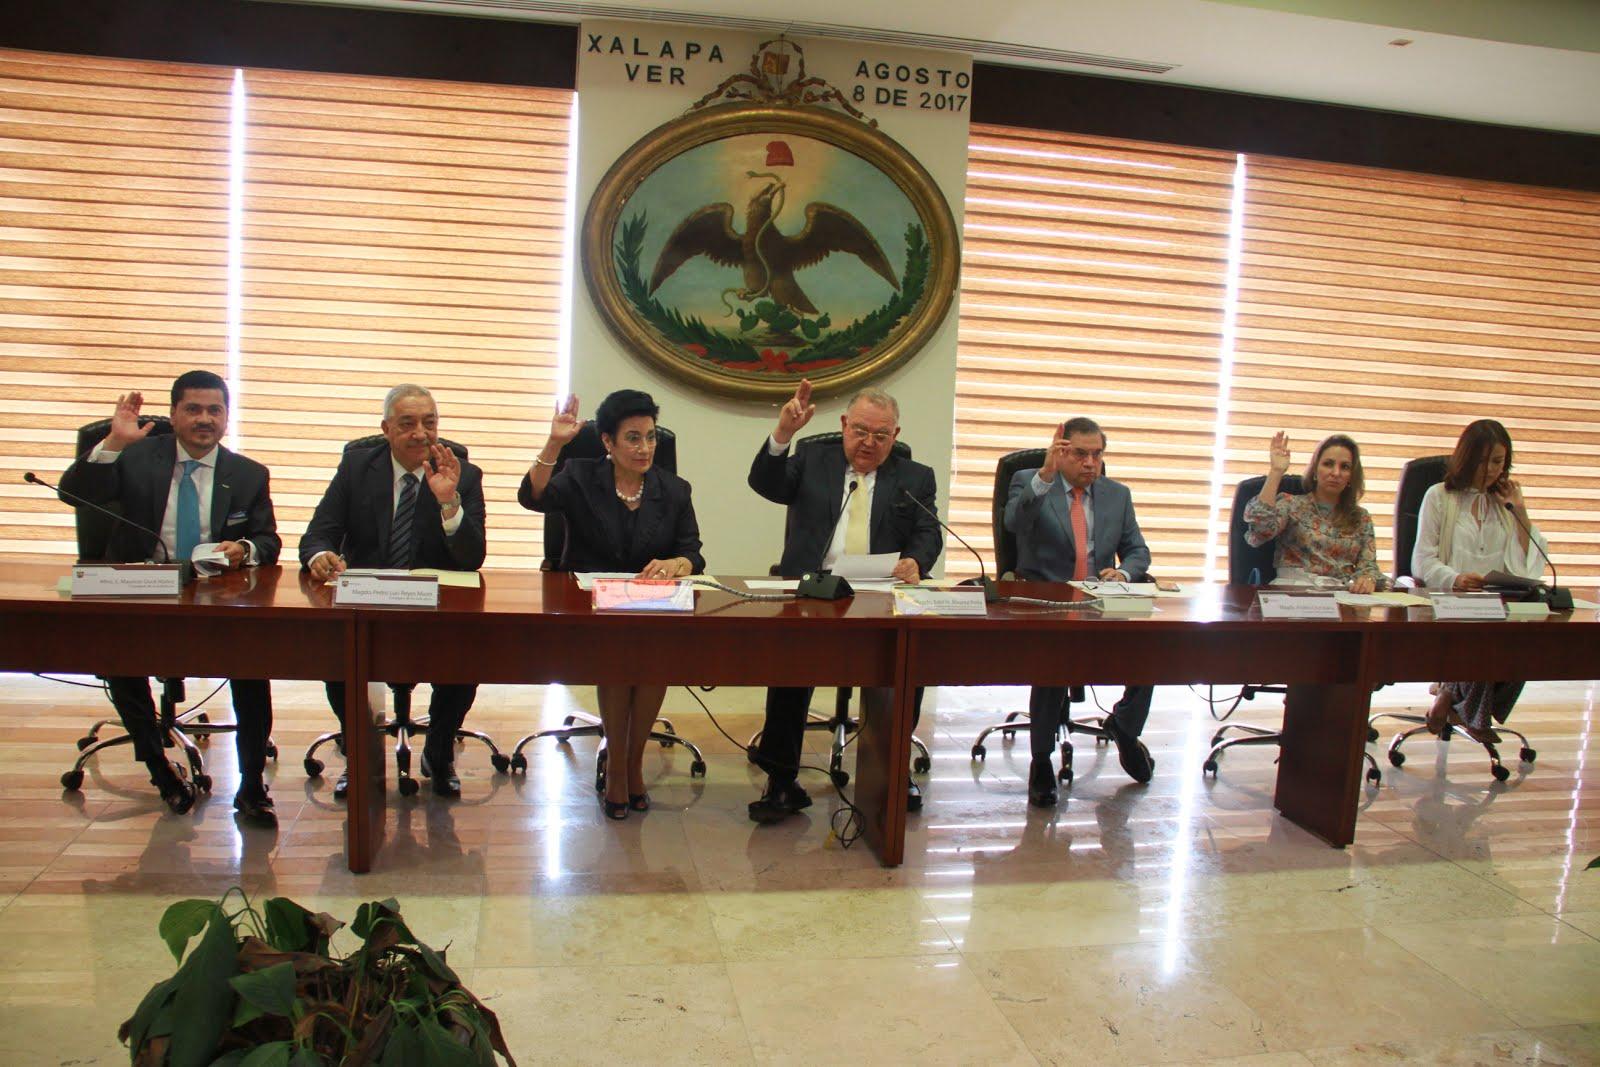 ORDENA PODER JUDICIAL QUE CADA ABOGADO EN EL ESTADO, SE REGISTRE PARA PODER LITIGAR